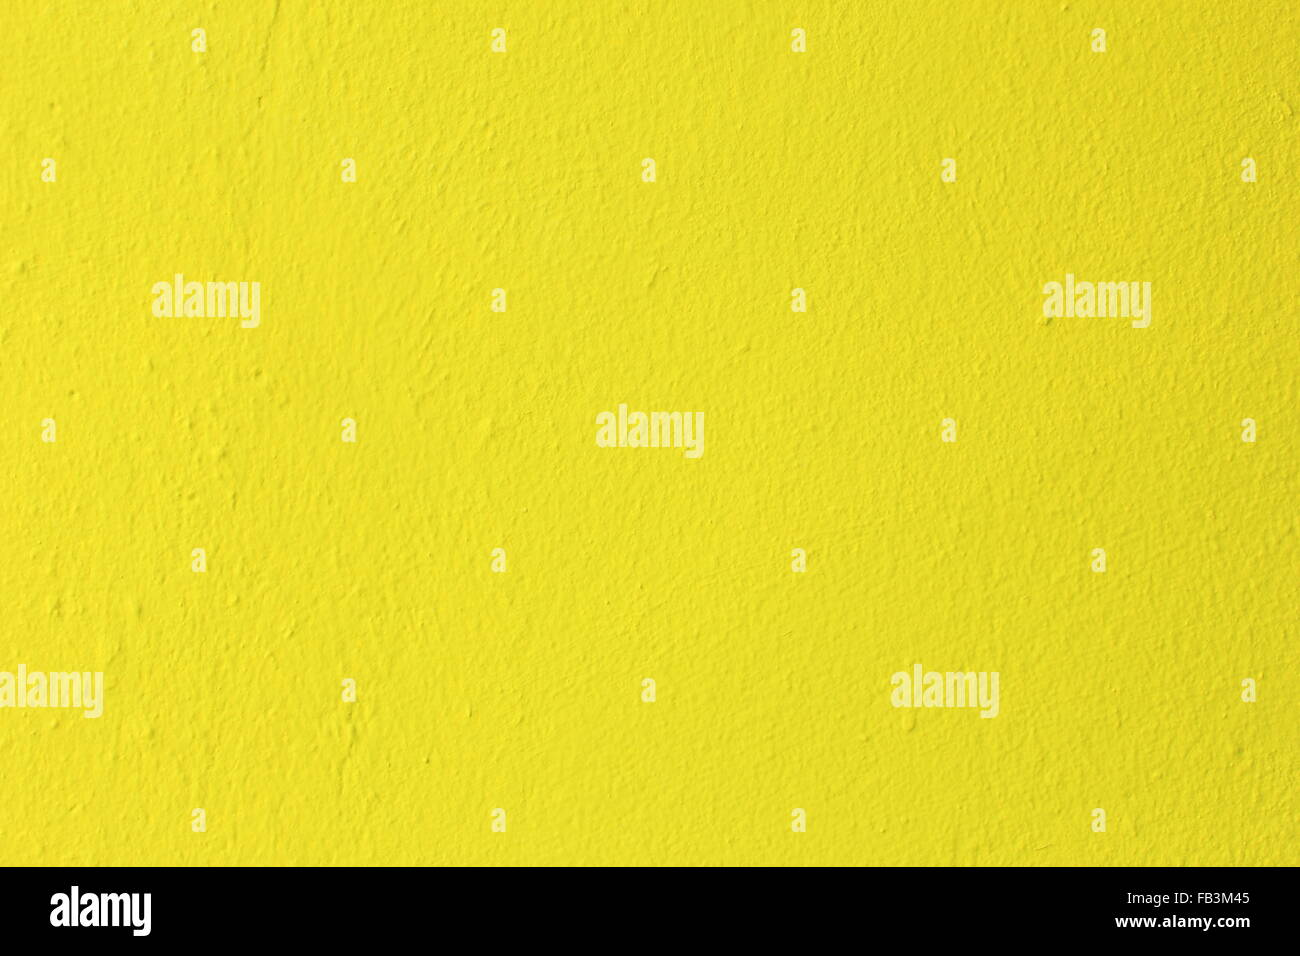 Yellow Concrete Stock Photos & Yellow Concrete Stock Images - Alamy